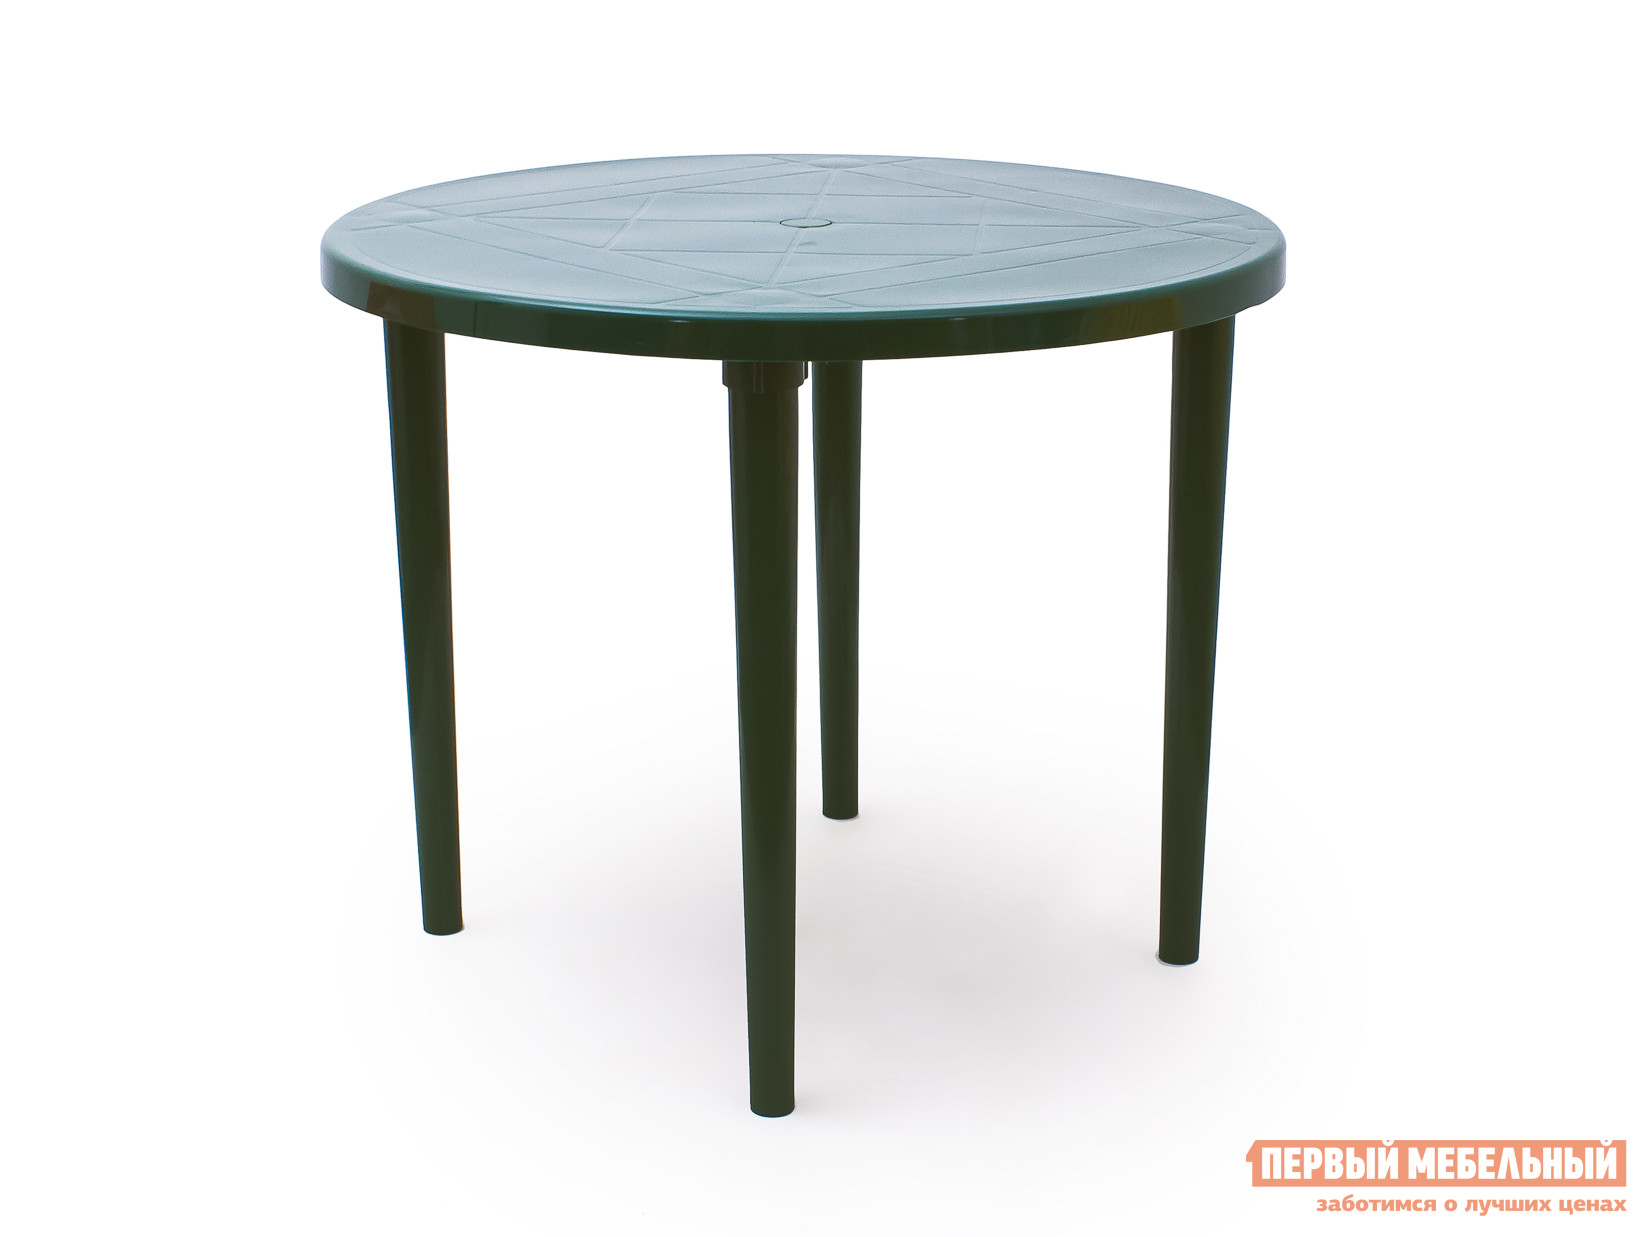 Пластиковый стол Стандарт Пластик Стол круглый, д. 900 мм Темно-зеленый